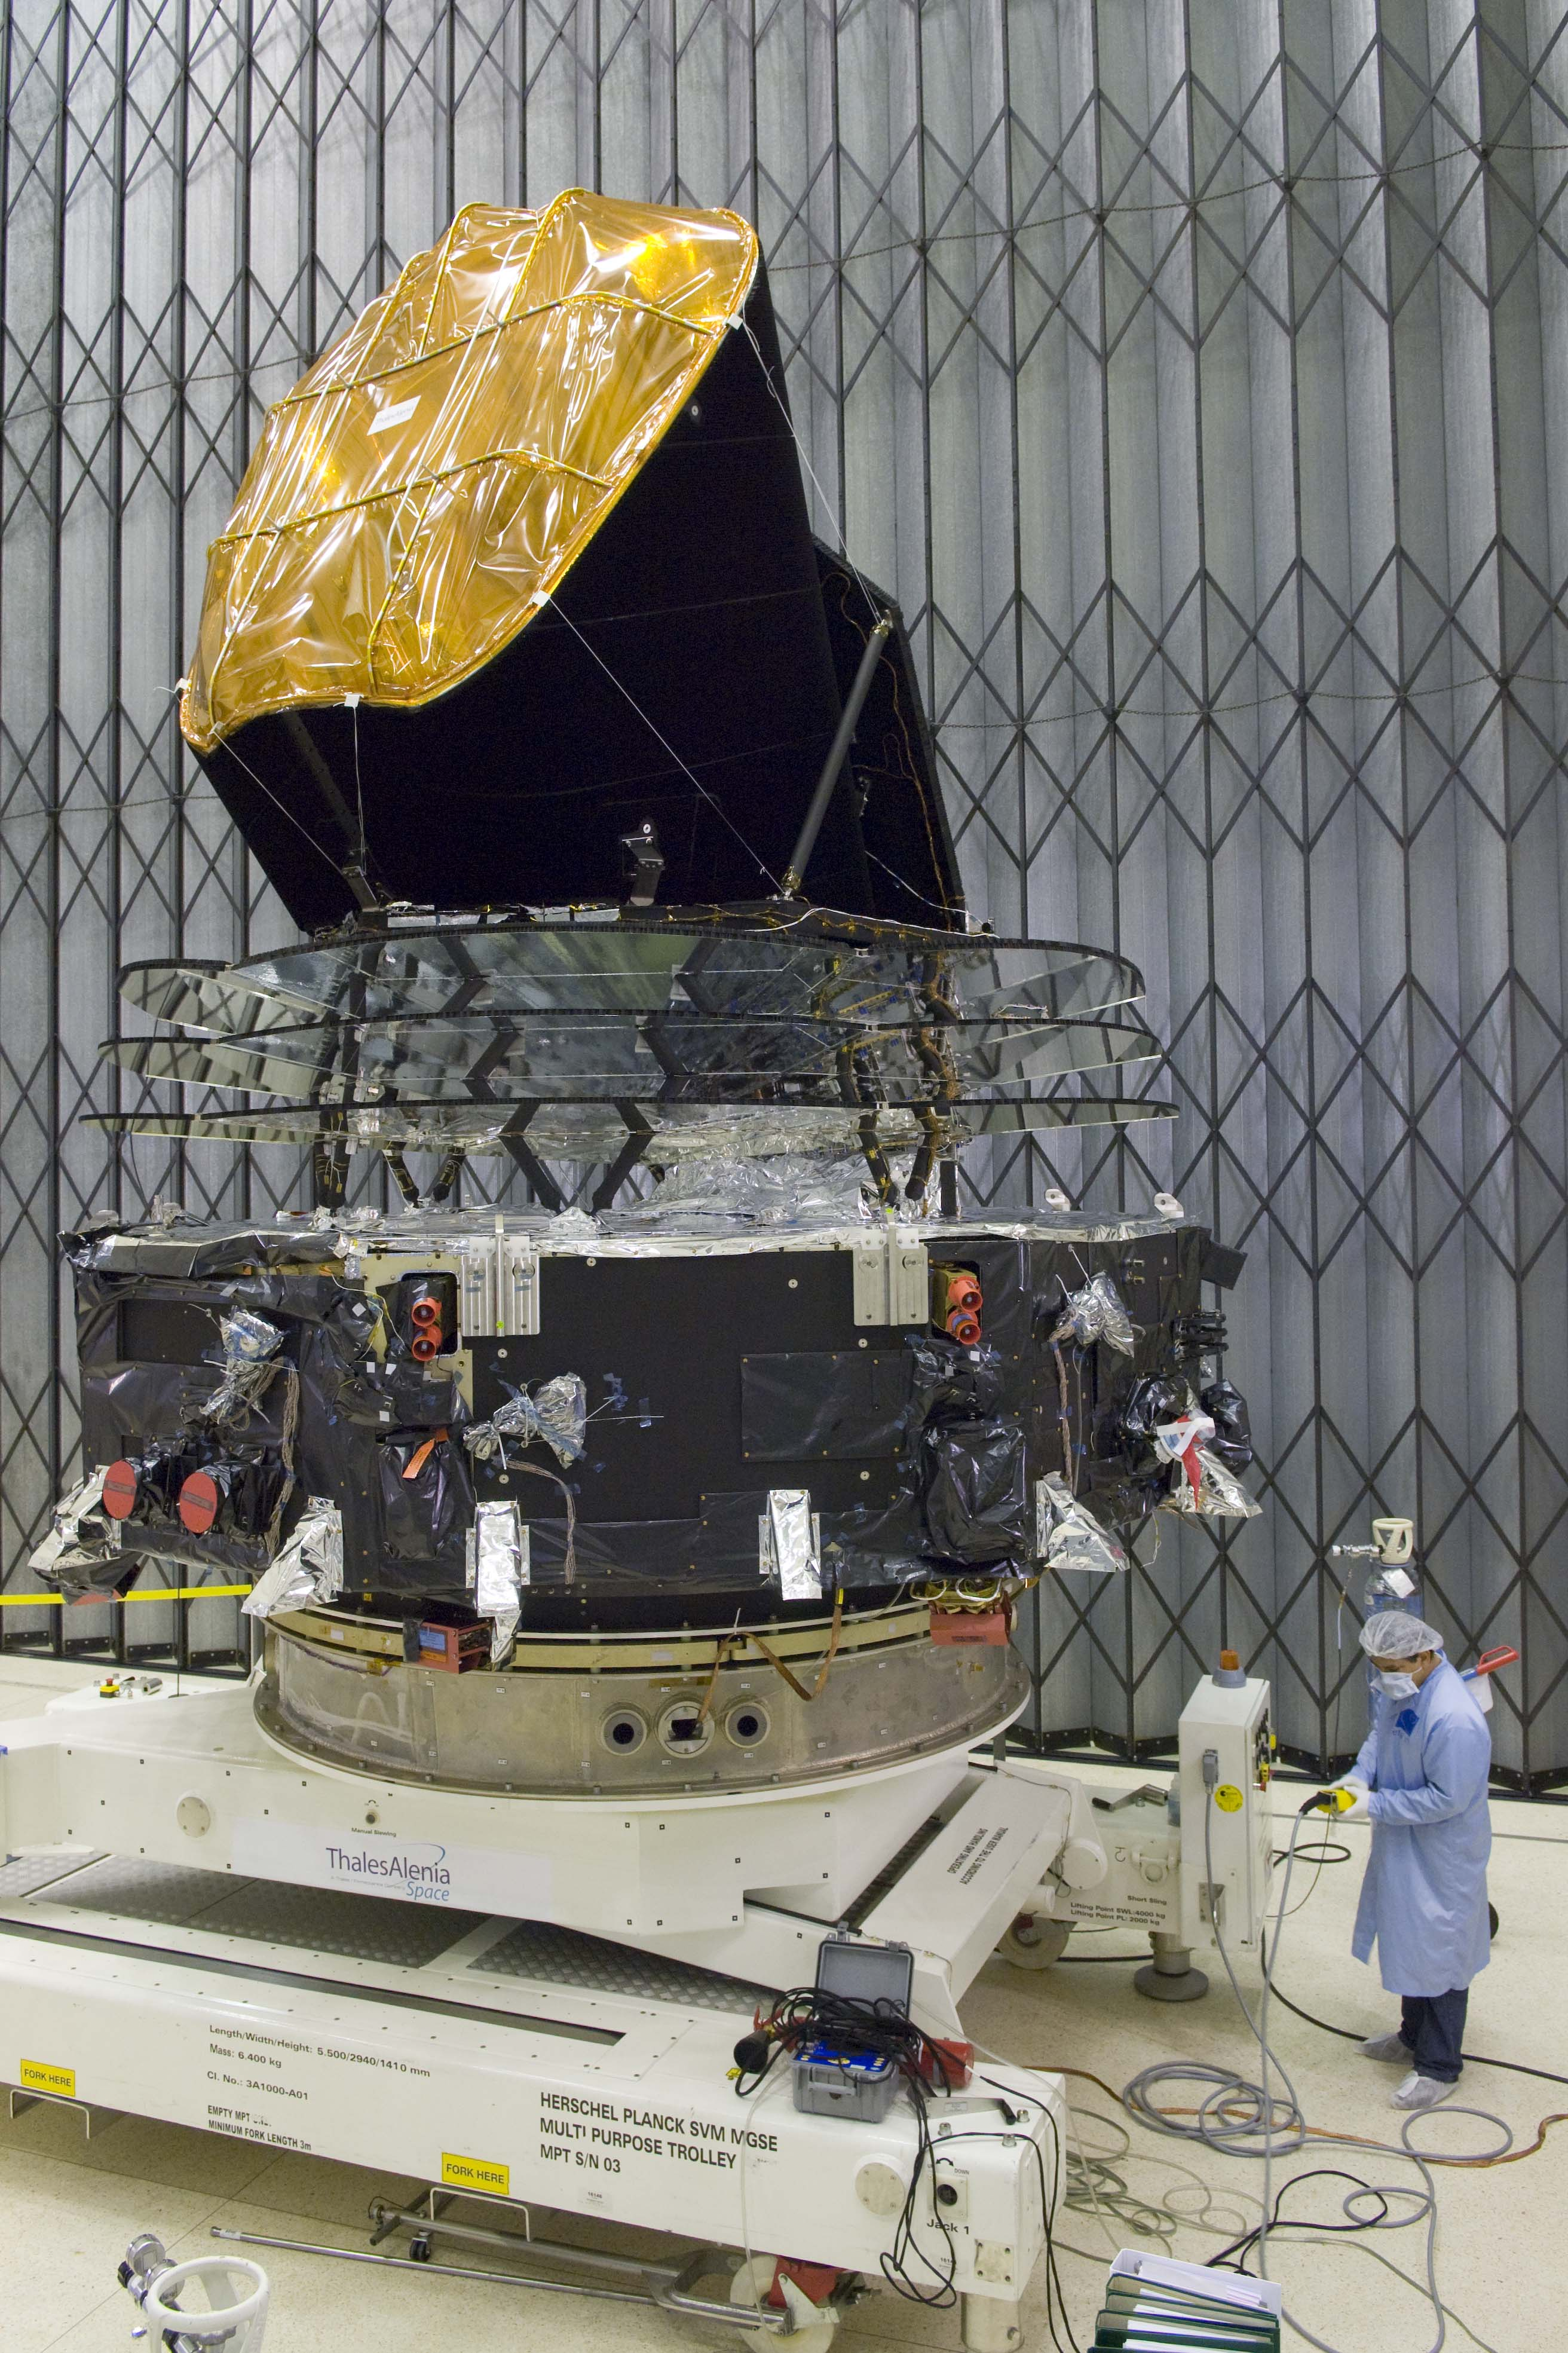 1567217896796-Planck-spacecraft__ID_Pavo2008-1350.JPG